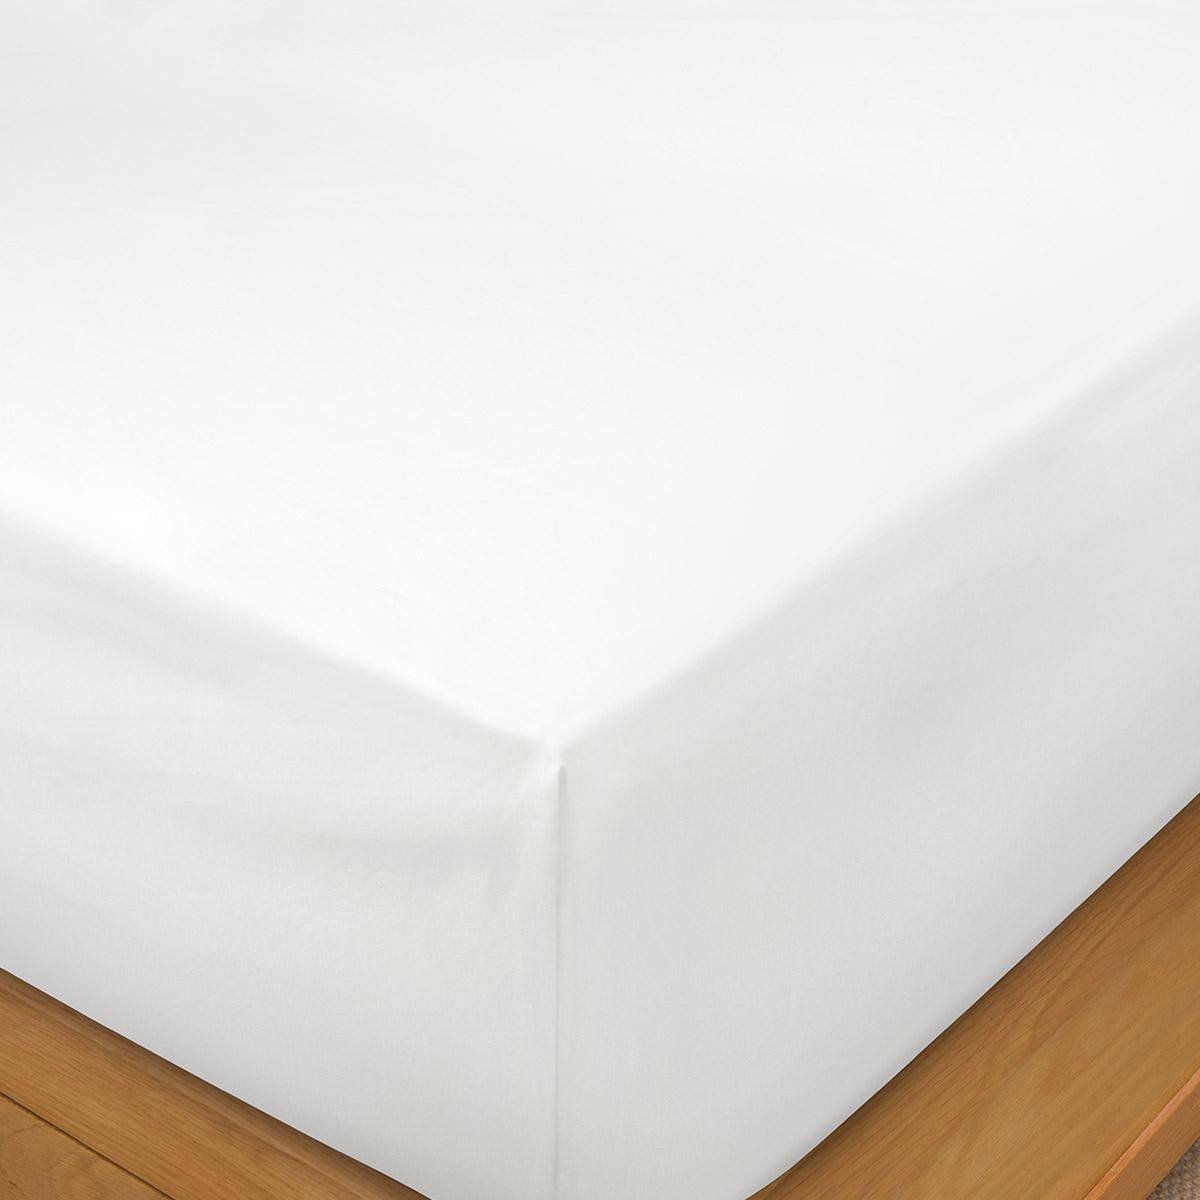 White 1000 Thread Count Supima Cotton Superking Flat Sheet